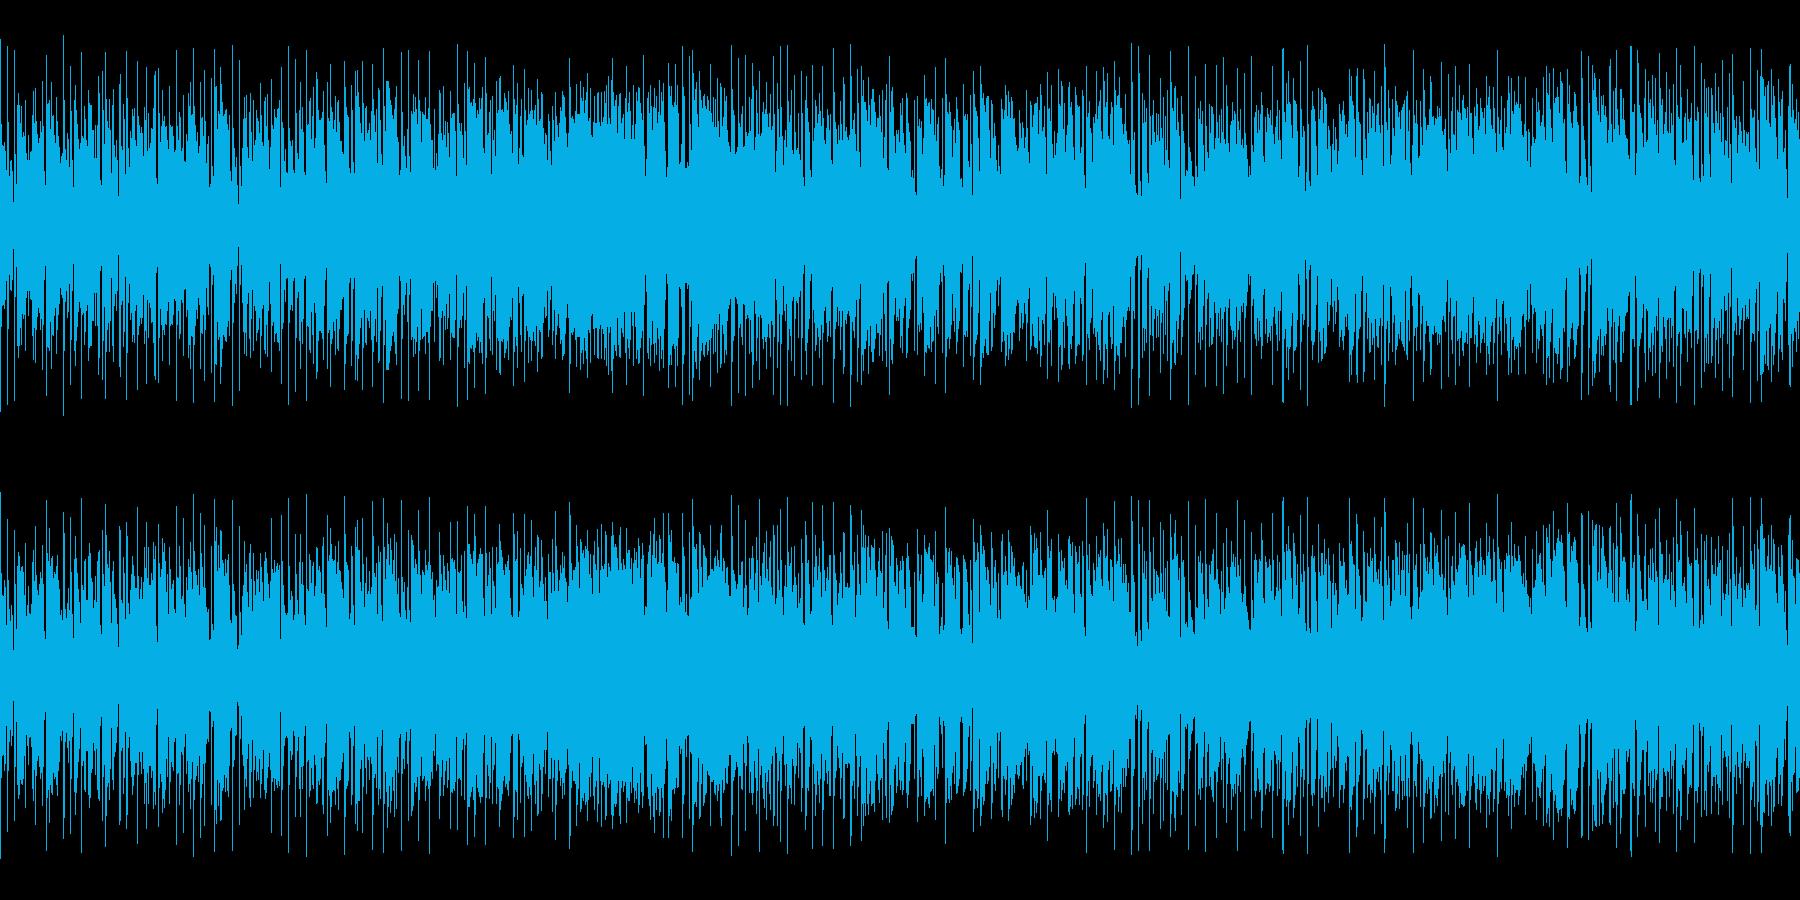 BGM012-03 商品紹介、会社紹介…の再生済みの波形